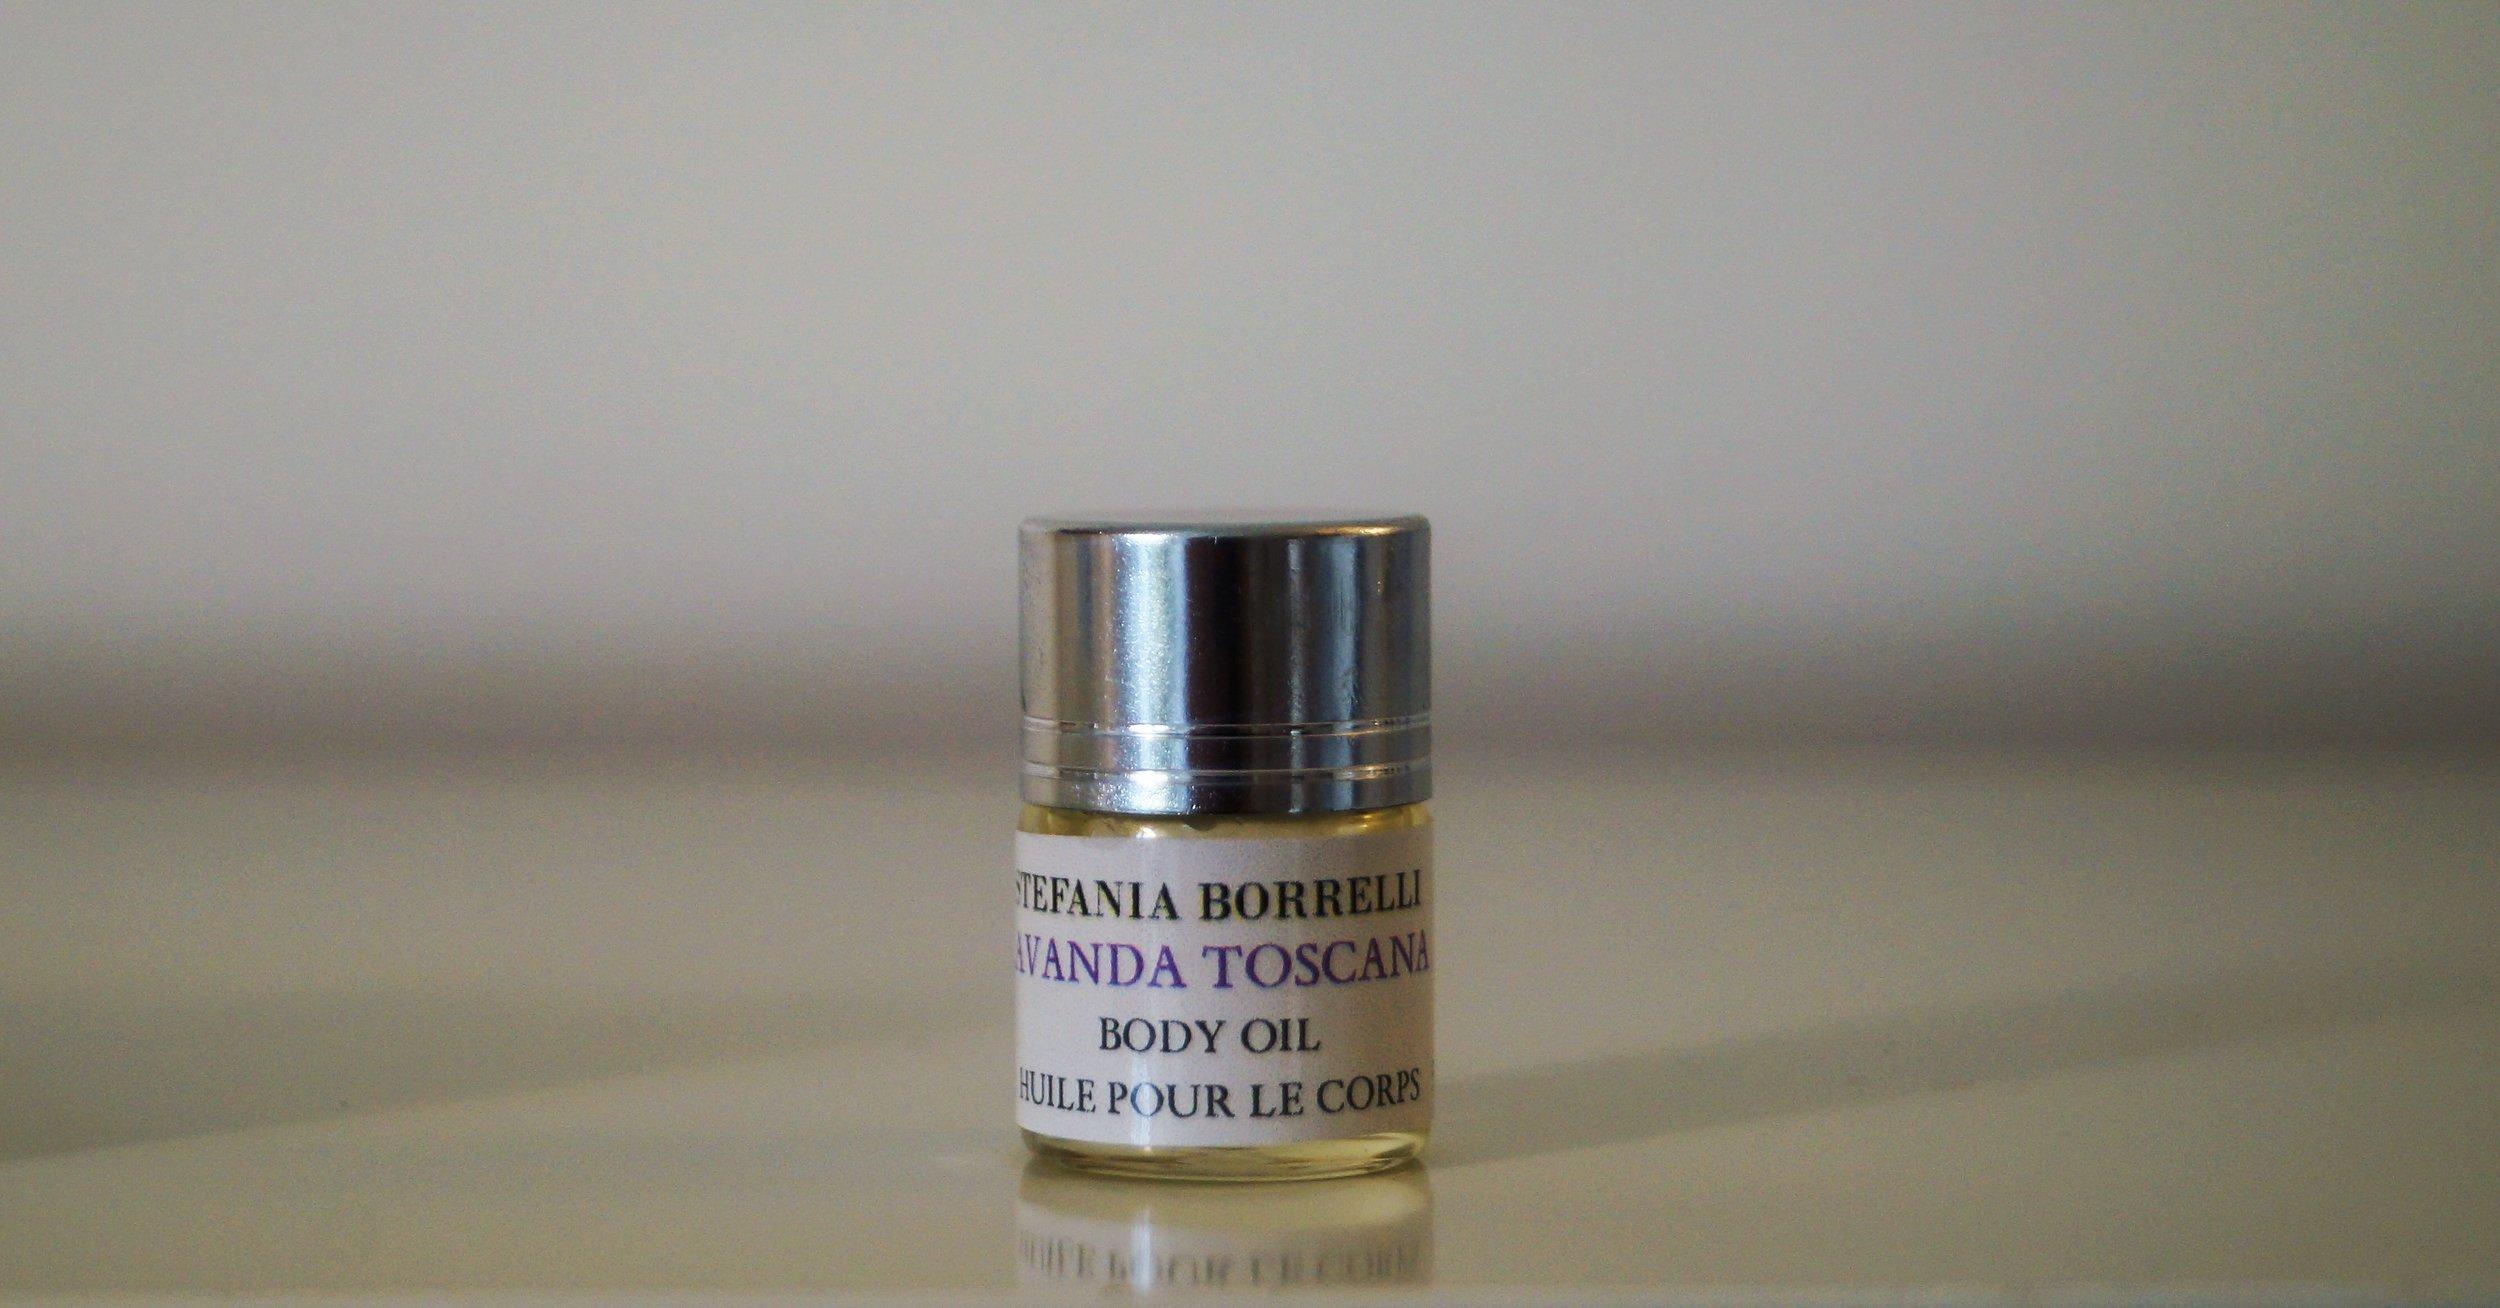 LAVANDA TOSCANA - Tuscan Lavender   Aroma: floral/herbaceous. Calming, relaxing and balancing.